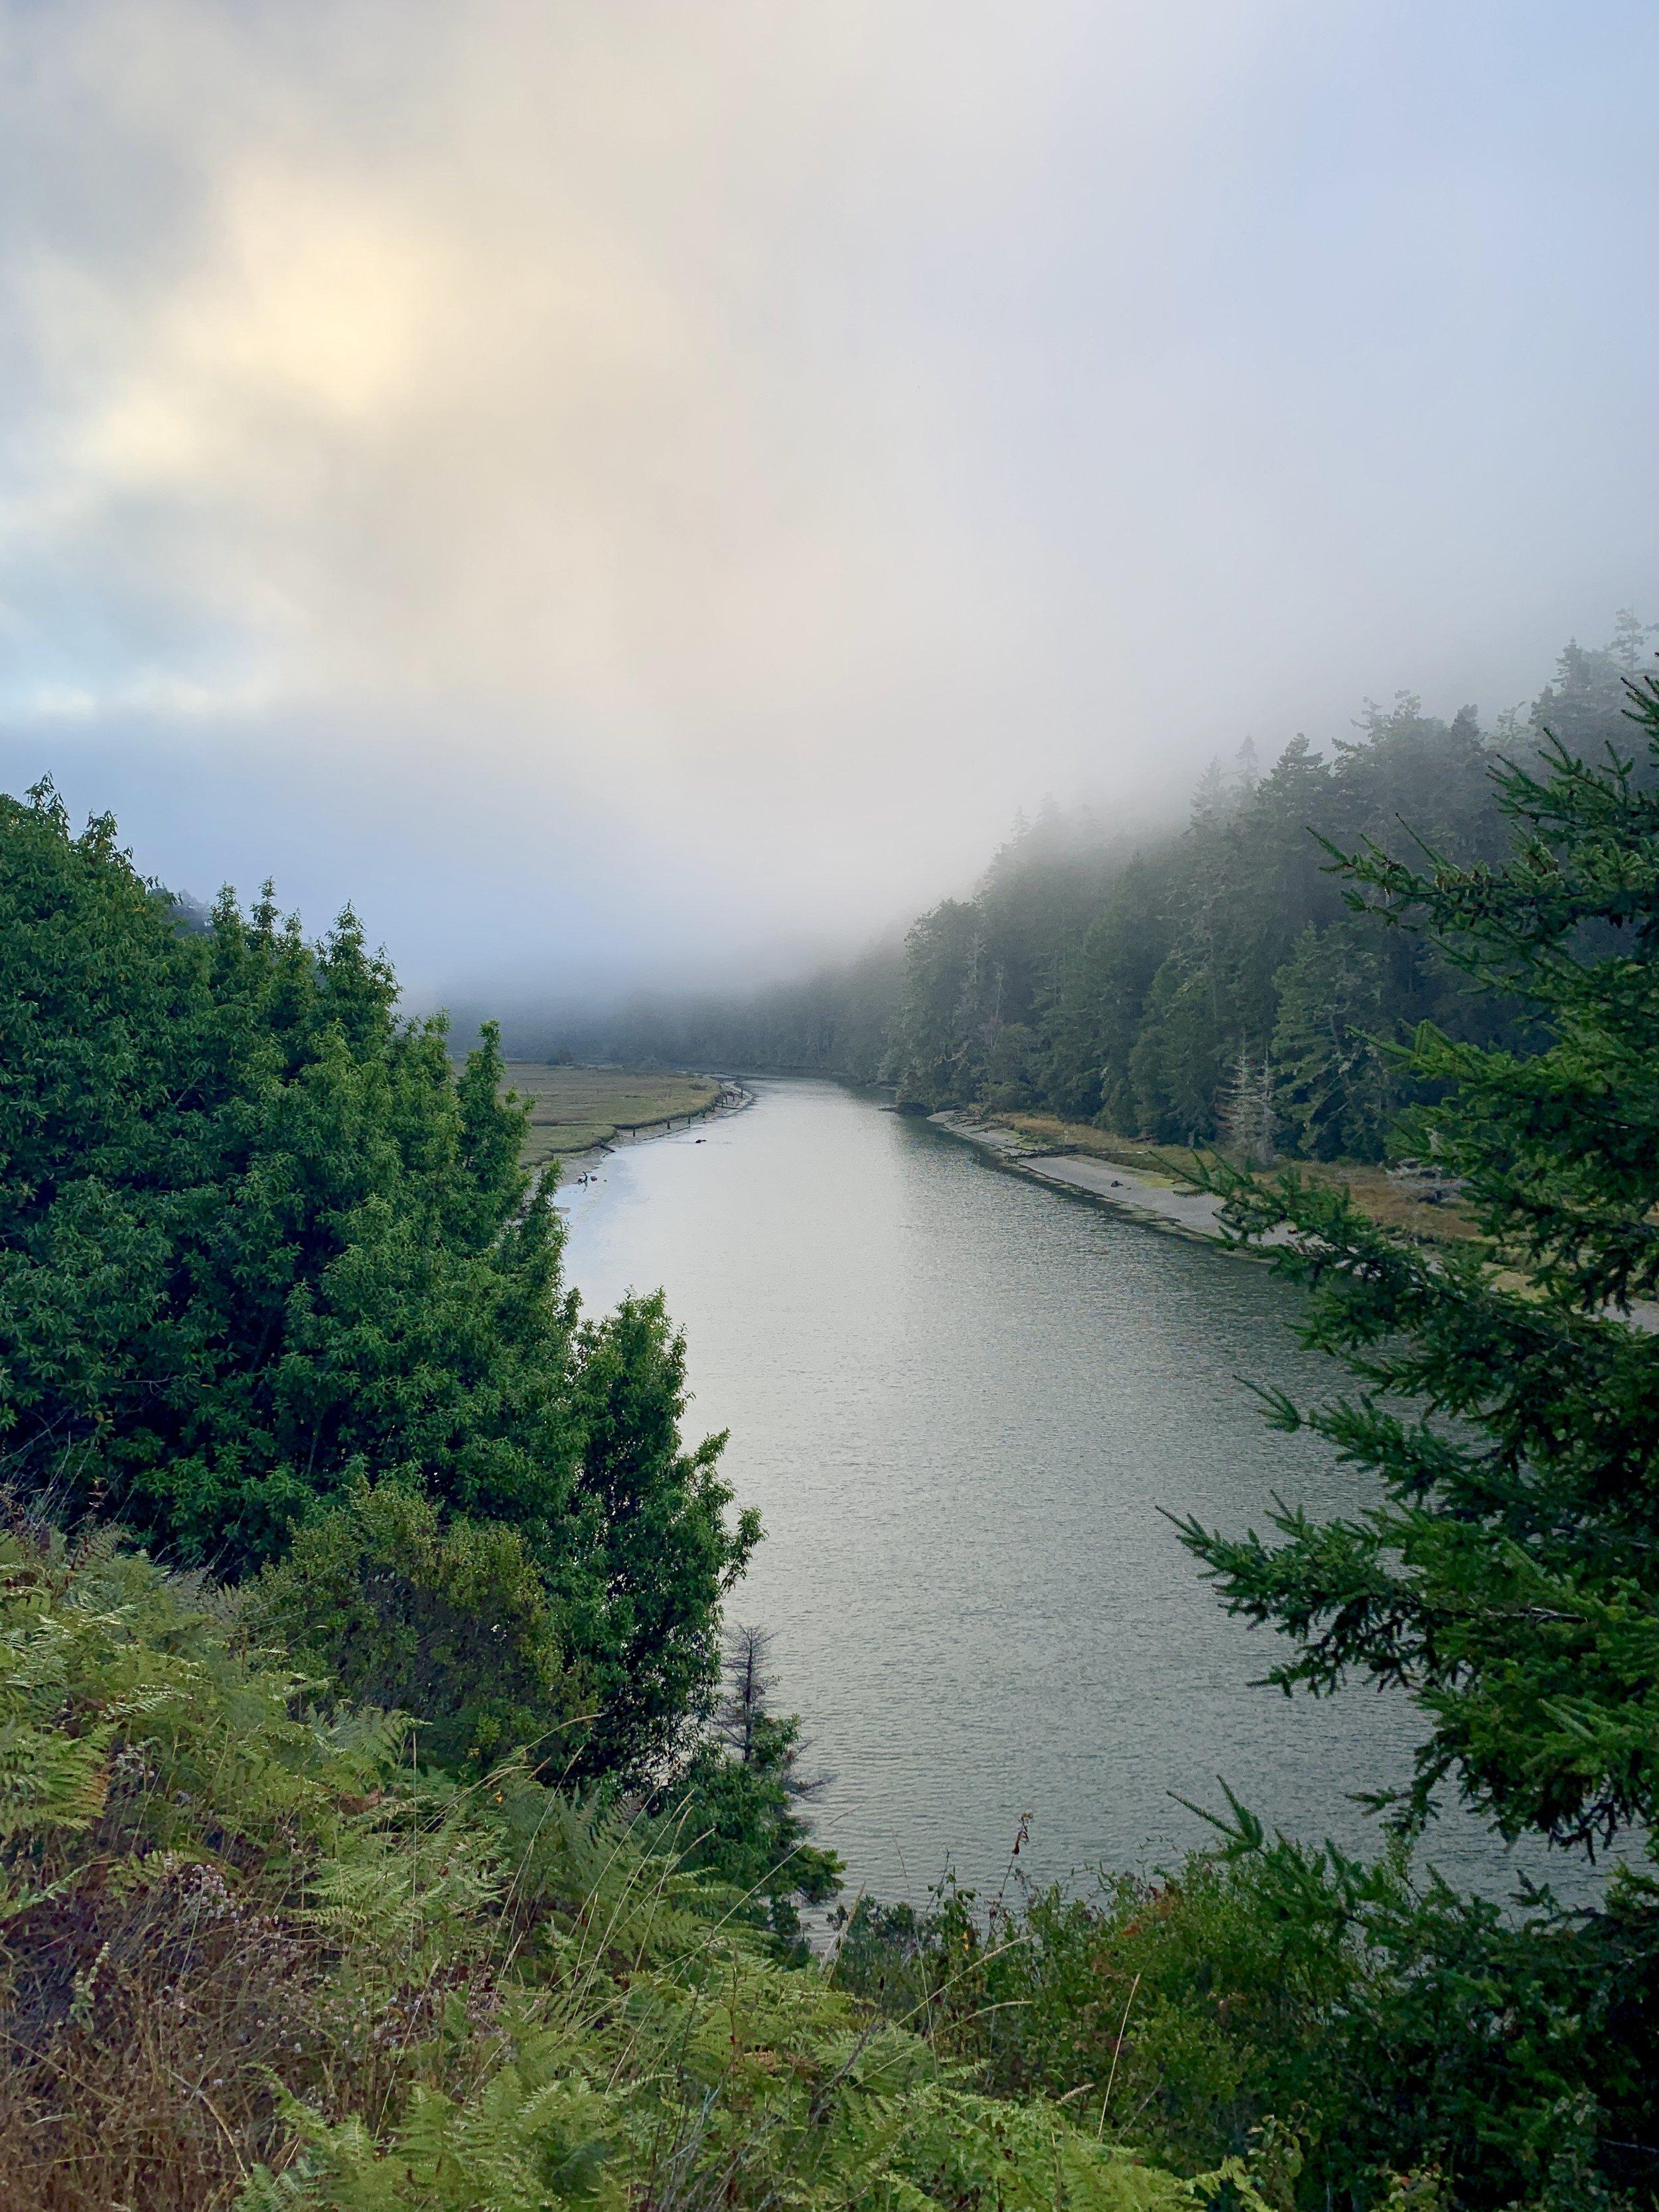 Glorious morning fog.